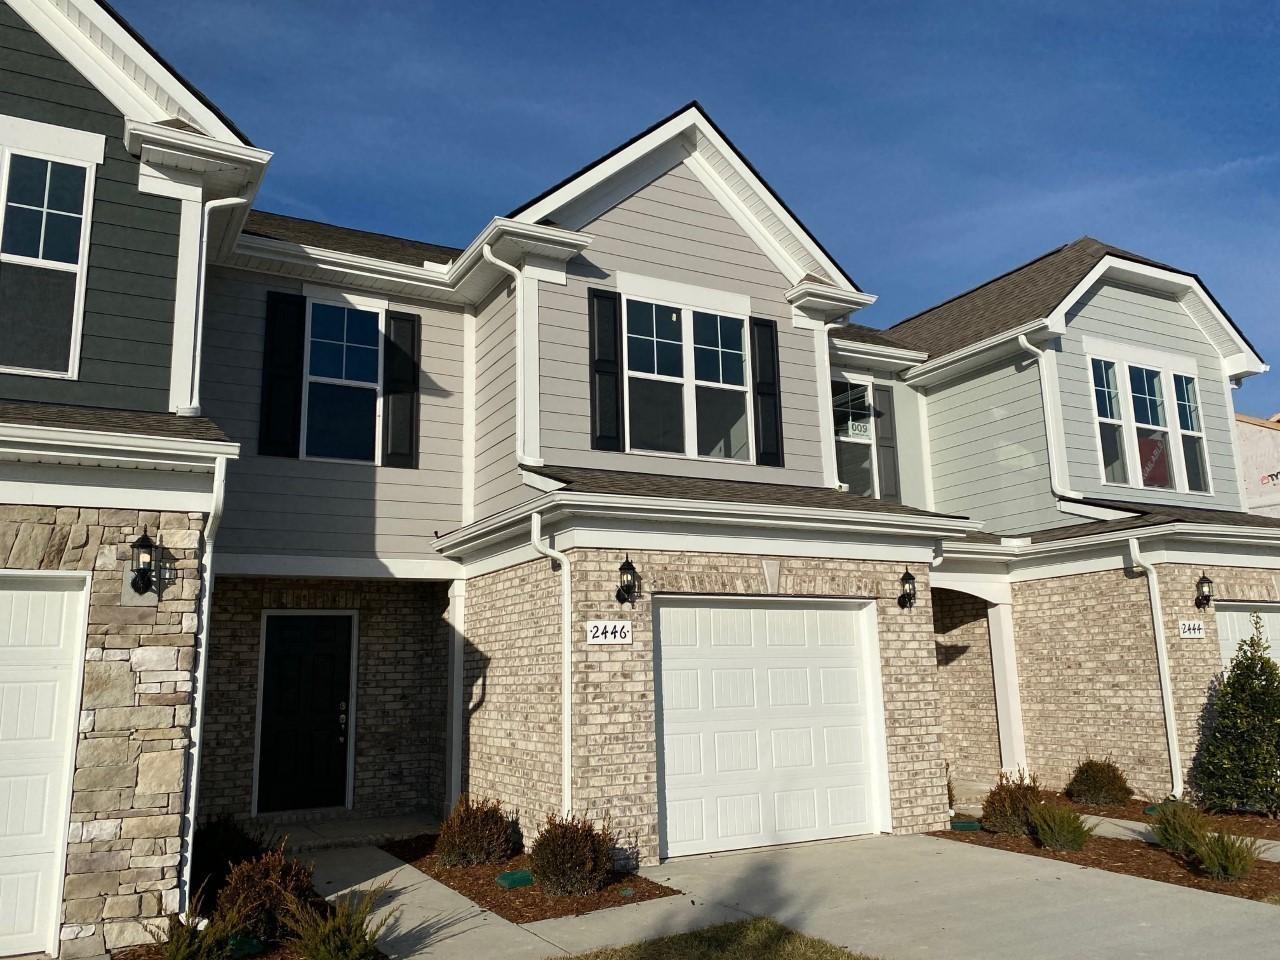 2426 Salem Creek Court Property Photo - Murfreesboro, TN real estate listing